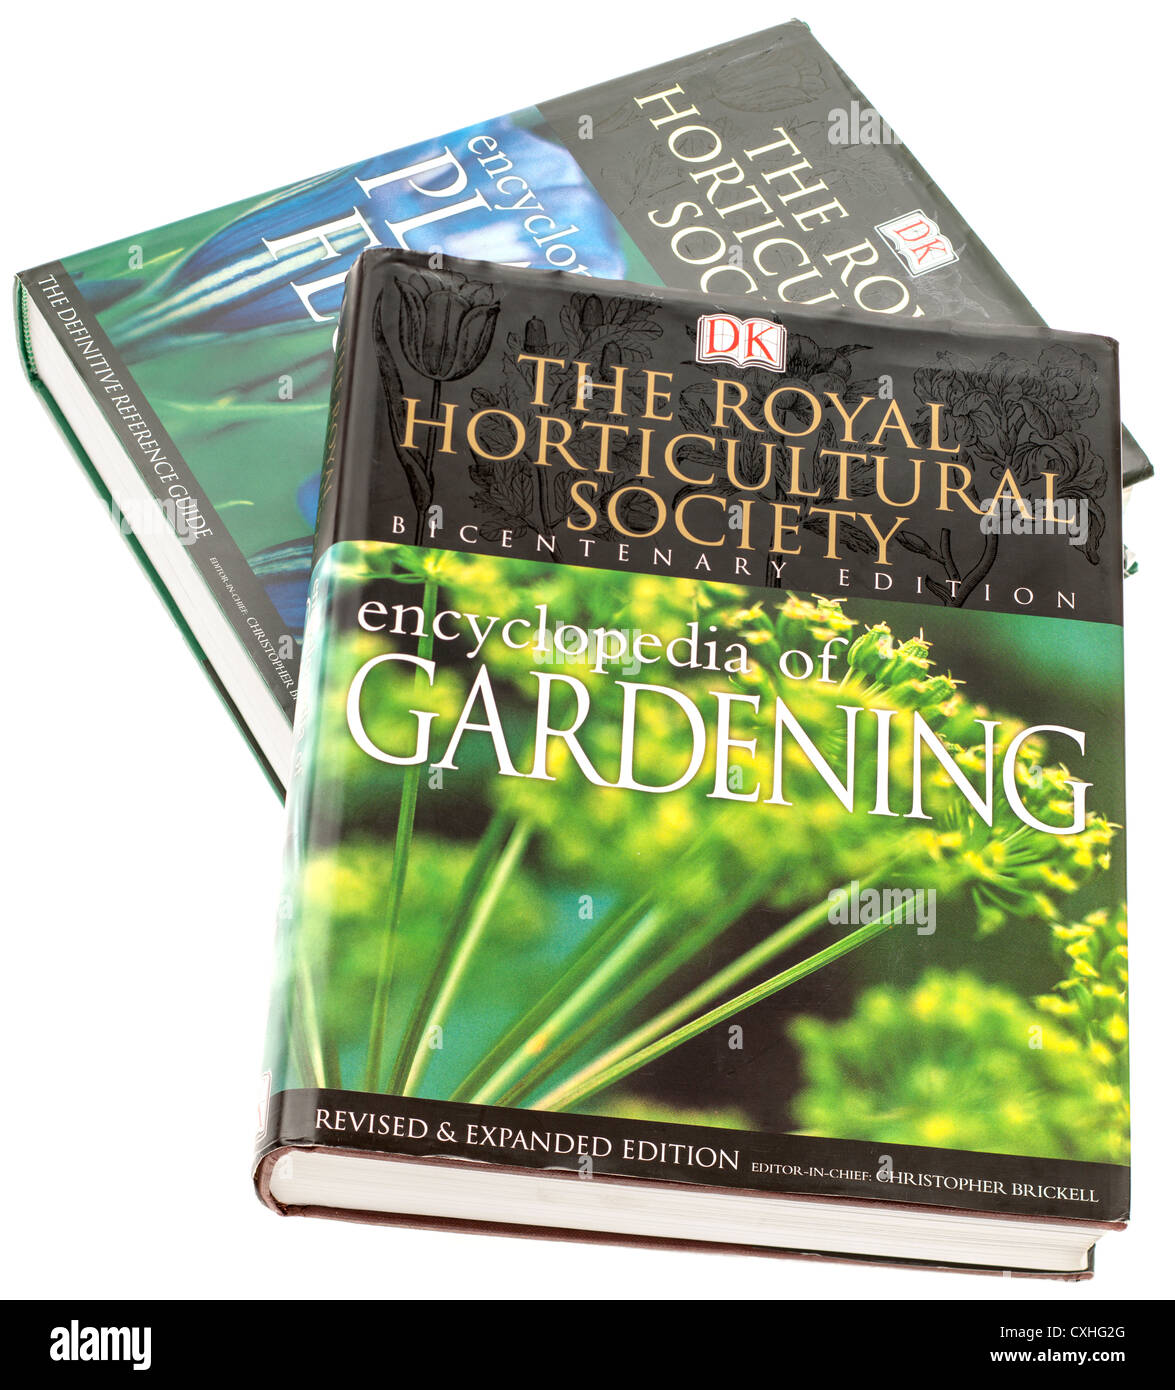 Royal Horticultural Society encyclopedia of gardening book and  Royal Horticultural Society encyclopedia of plants - Stock Image